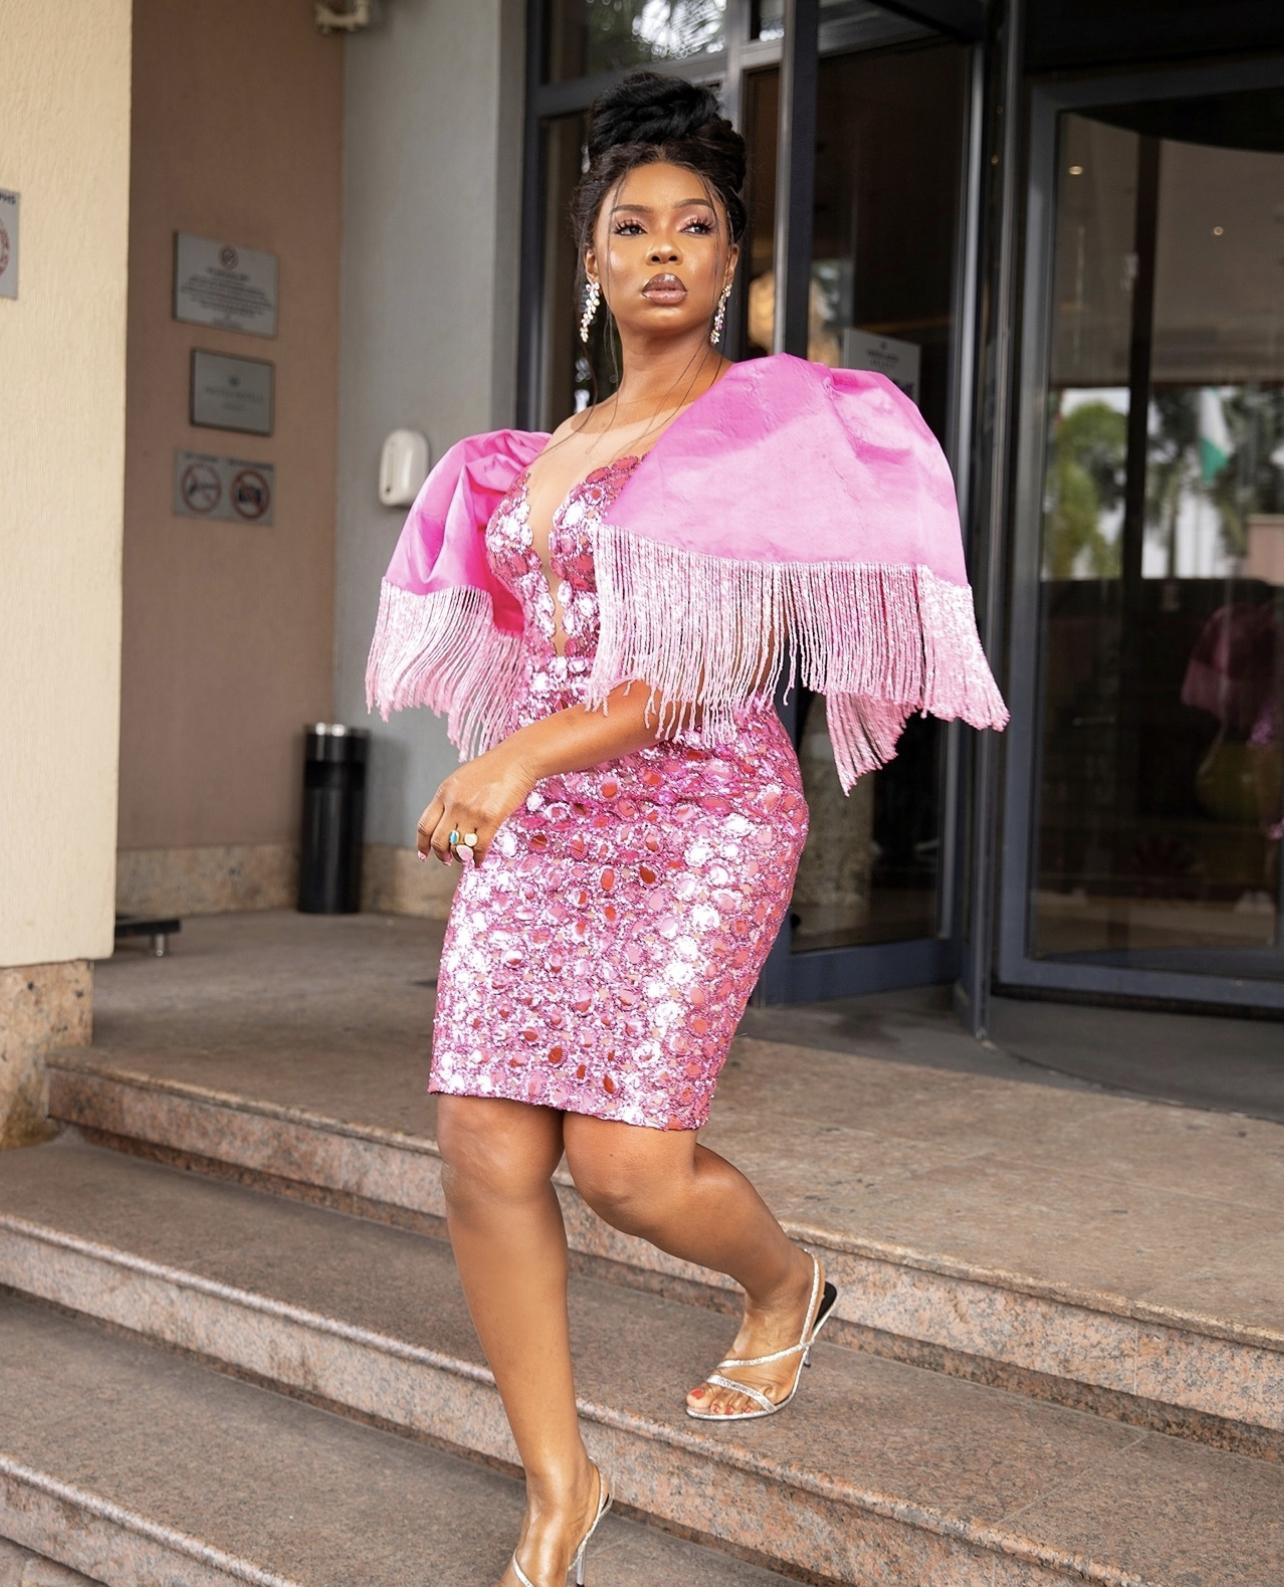 yemi alade the voice nigeria